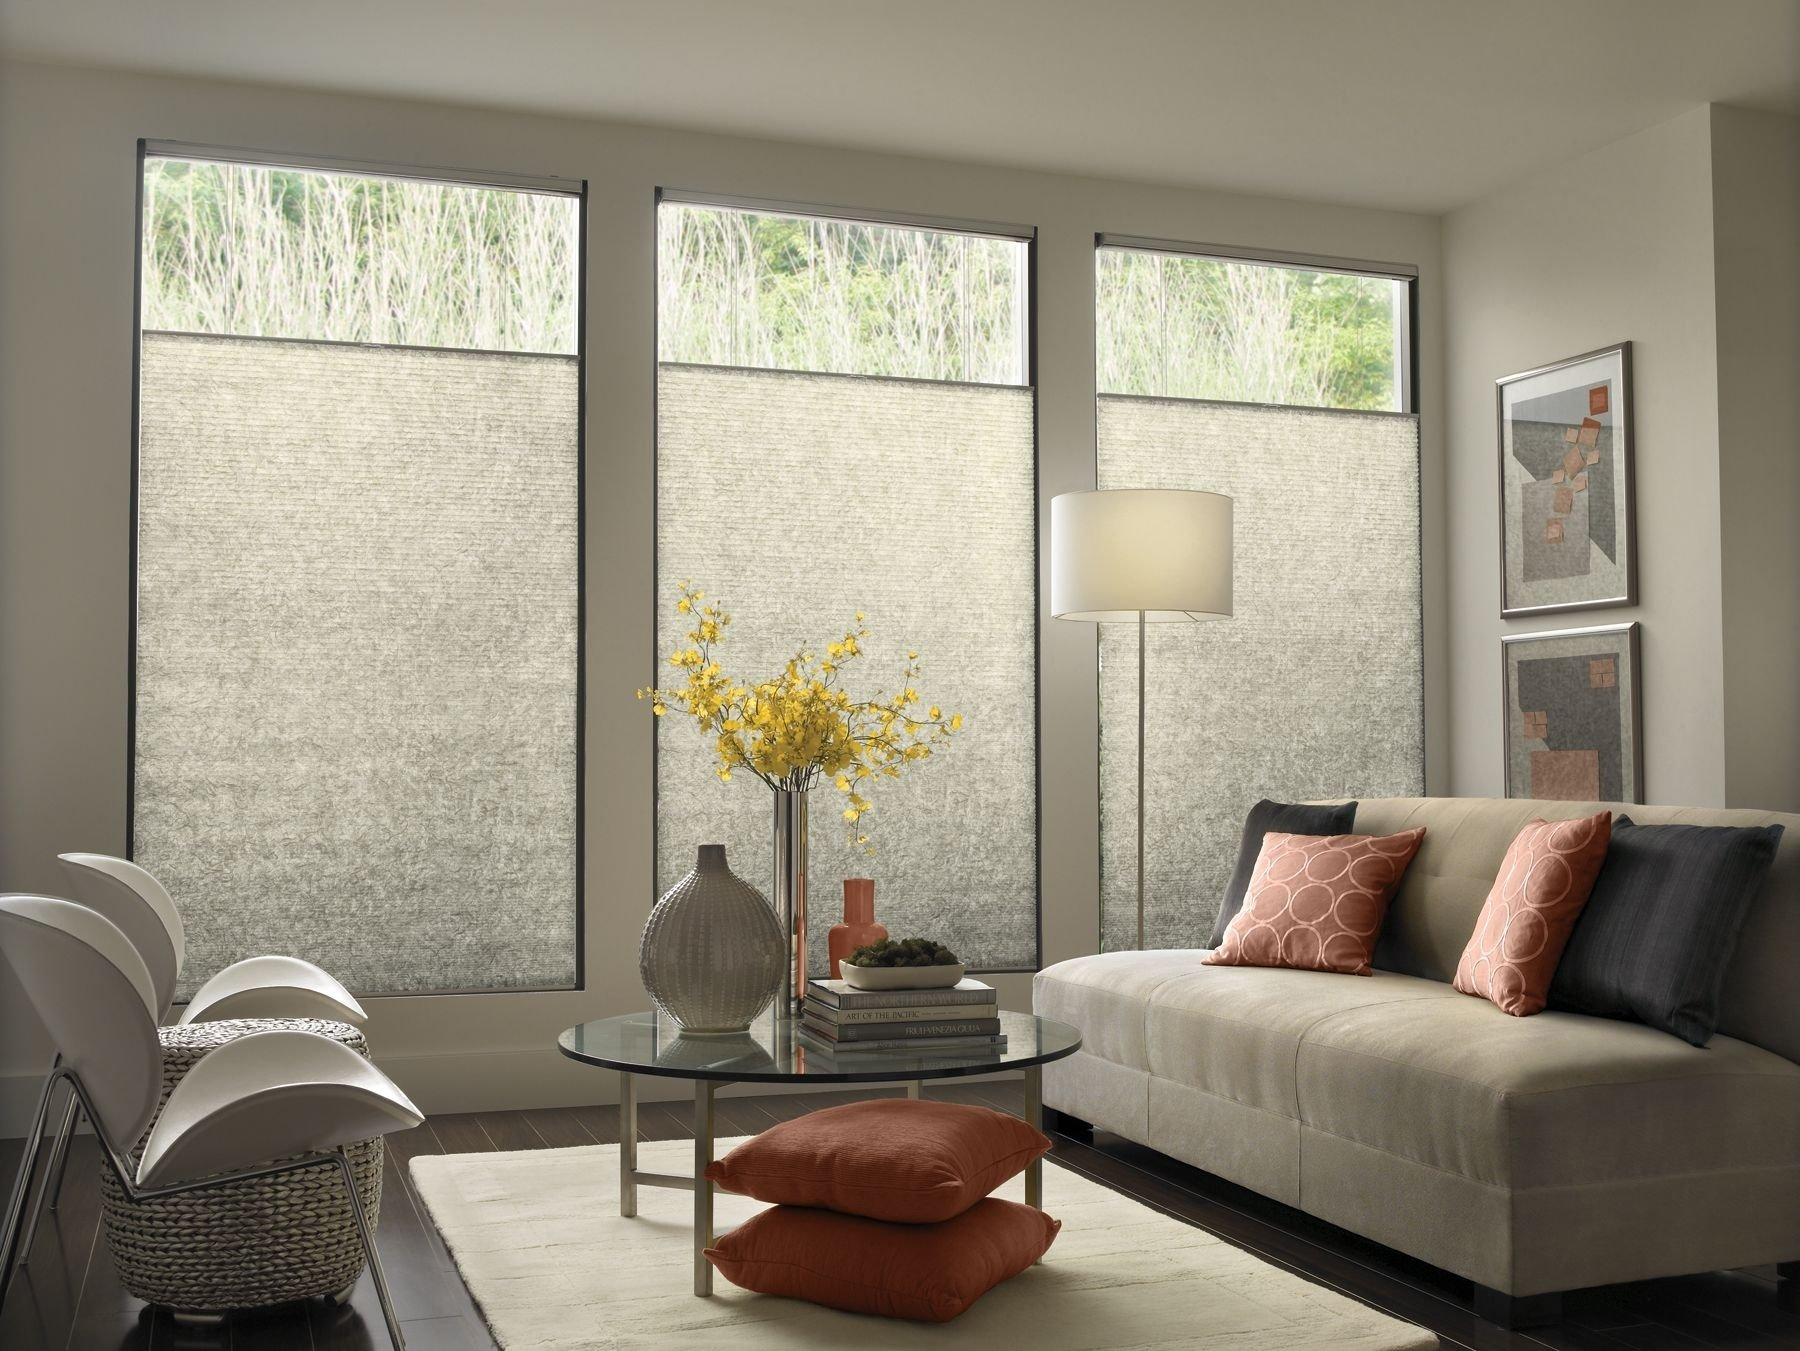 10 Cute Living Room Window Treatment Ideas modern contemporary window treatments with mid century modern sofa 1 2020